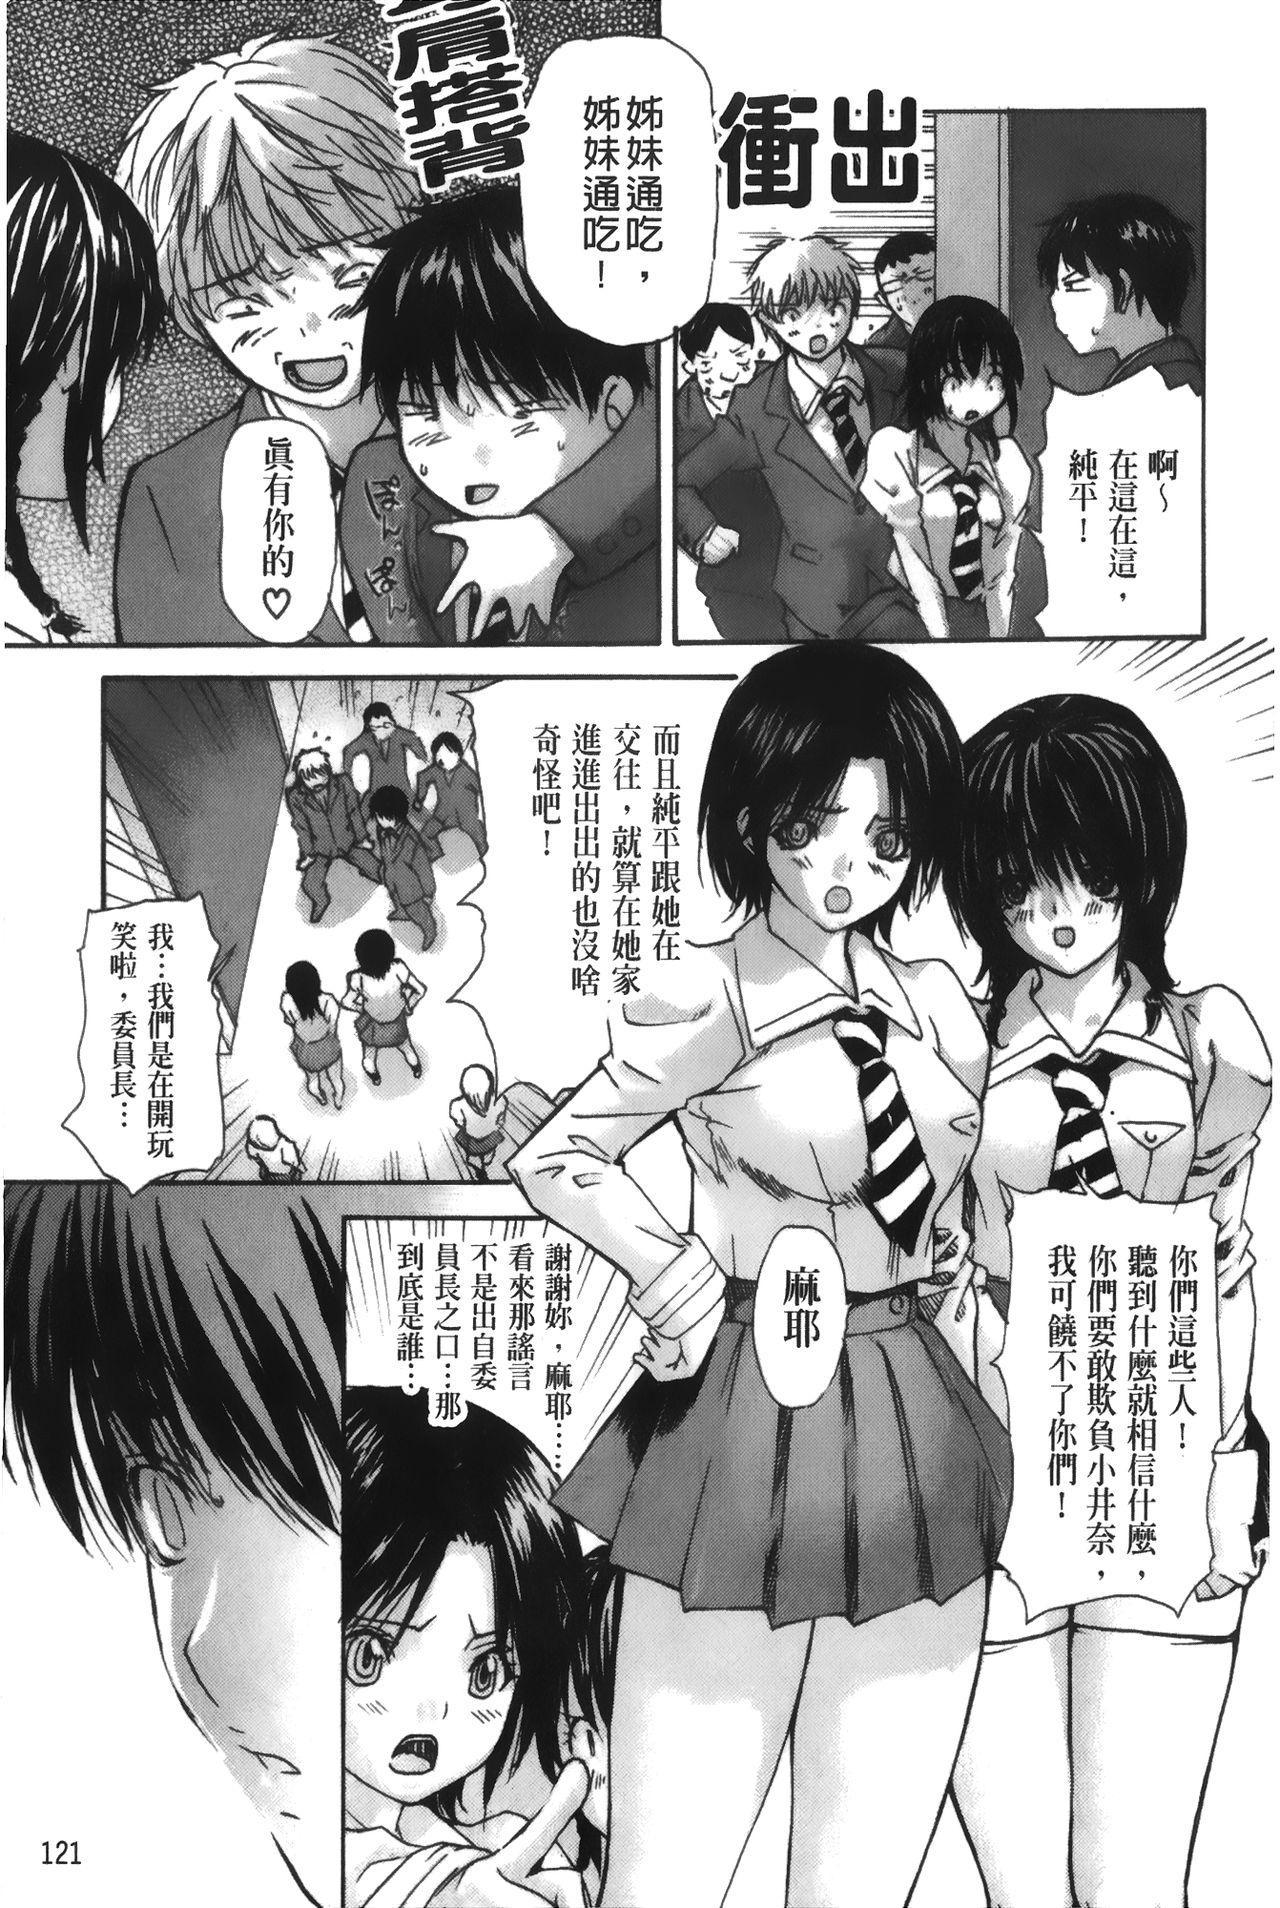 Tonari no Minano Sensei 4 | 隔壁的美奈乃老師 4 122